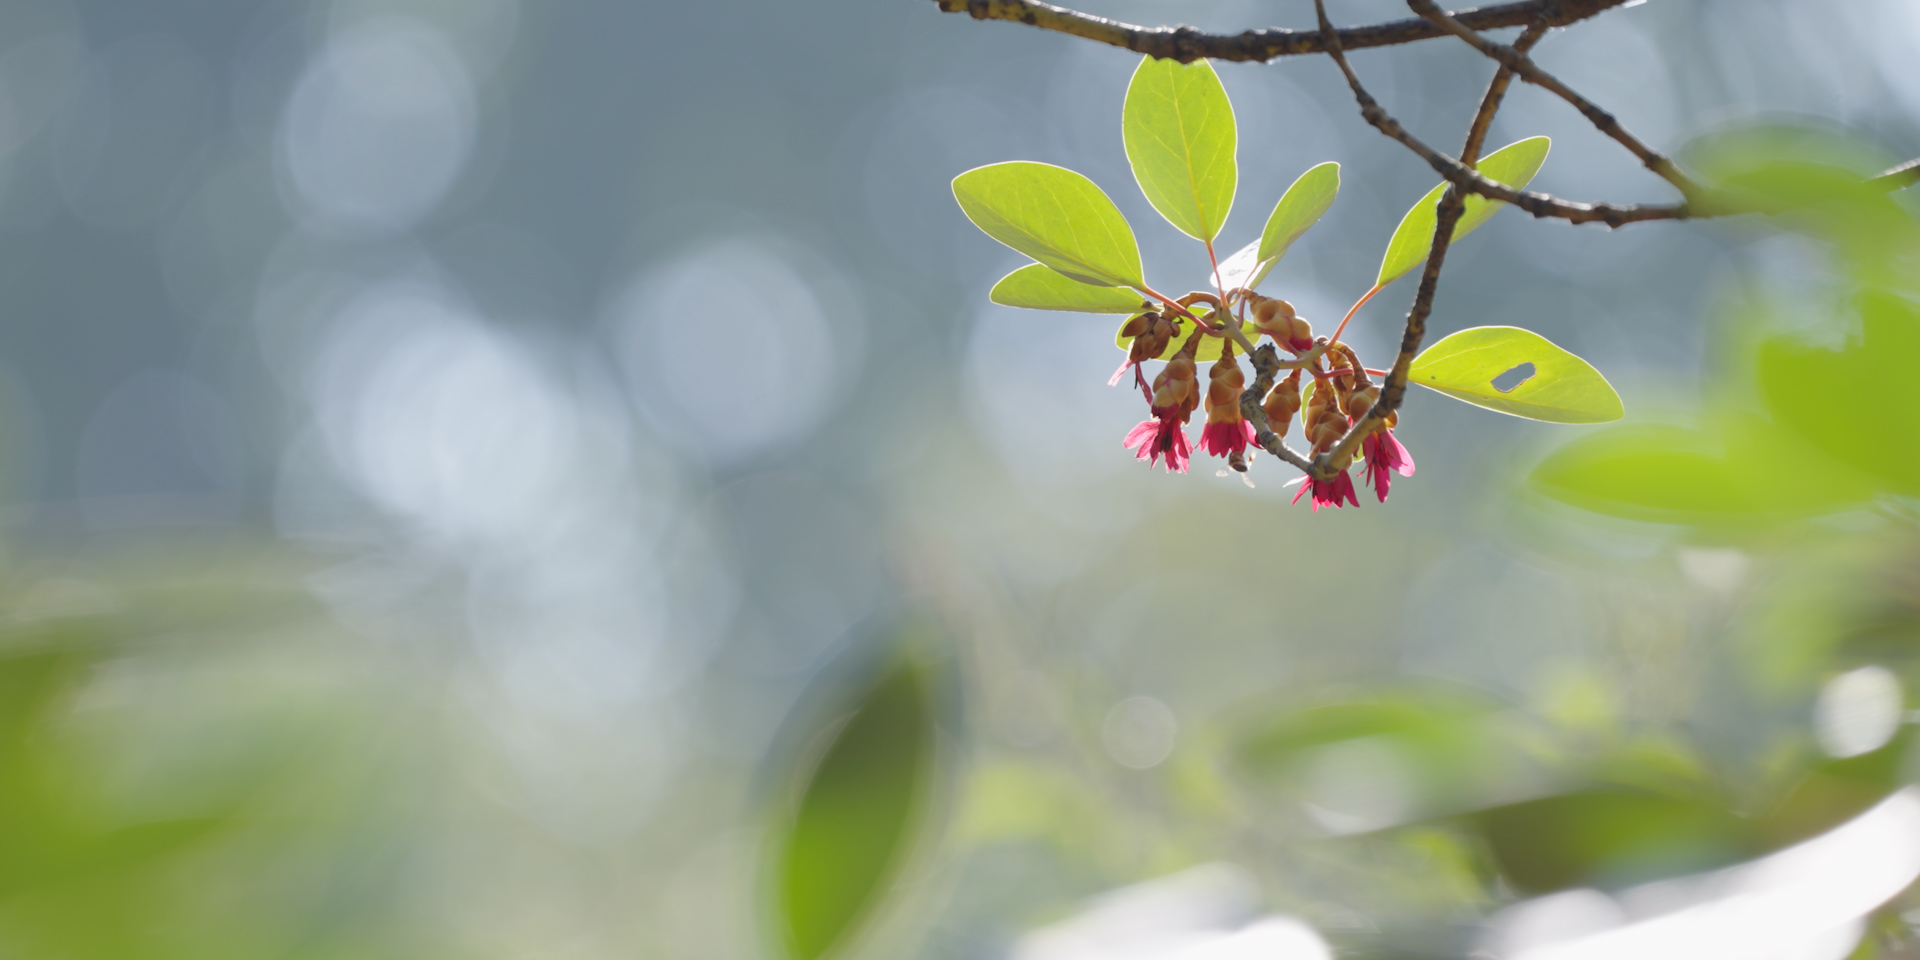 吊鐘王。 © FHS